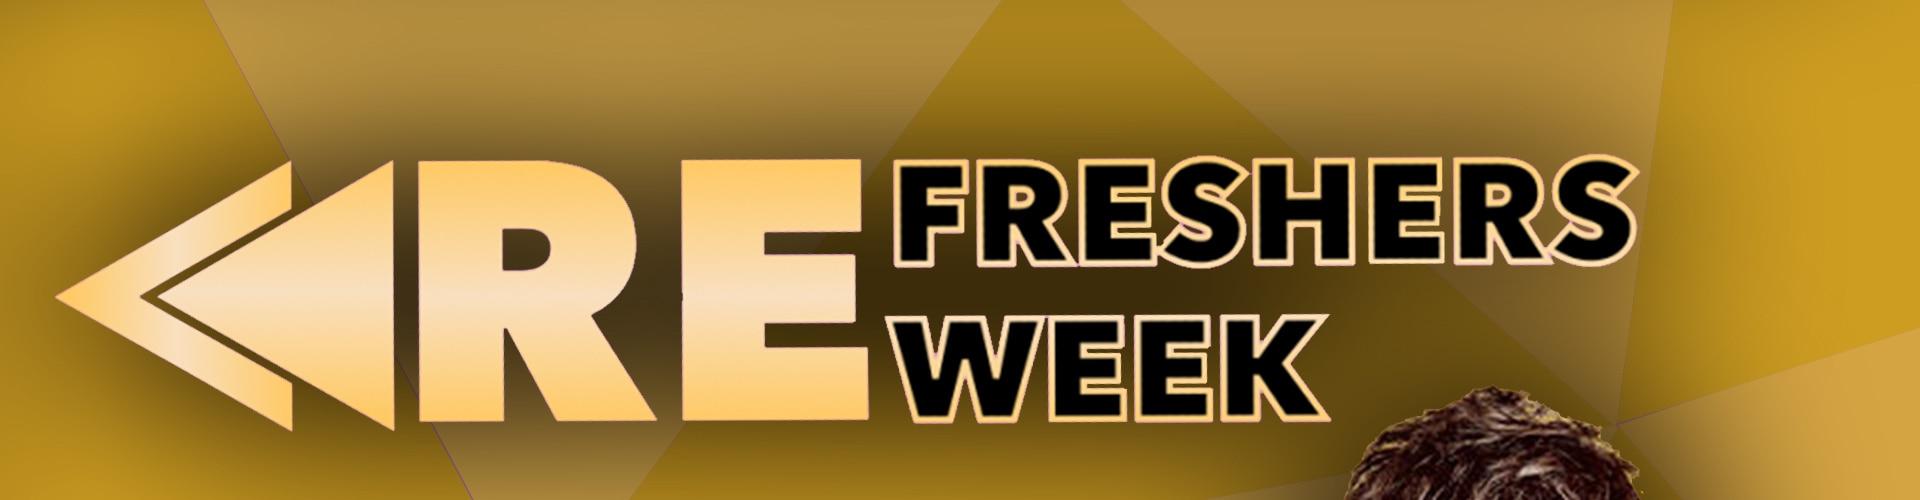 Watch Refreshers Week Online